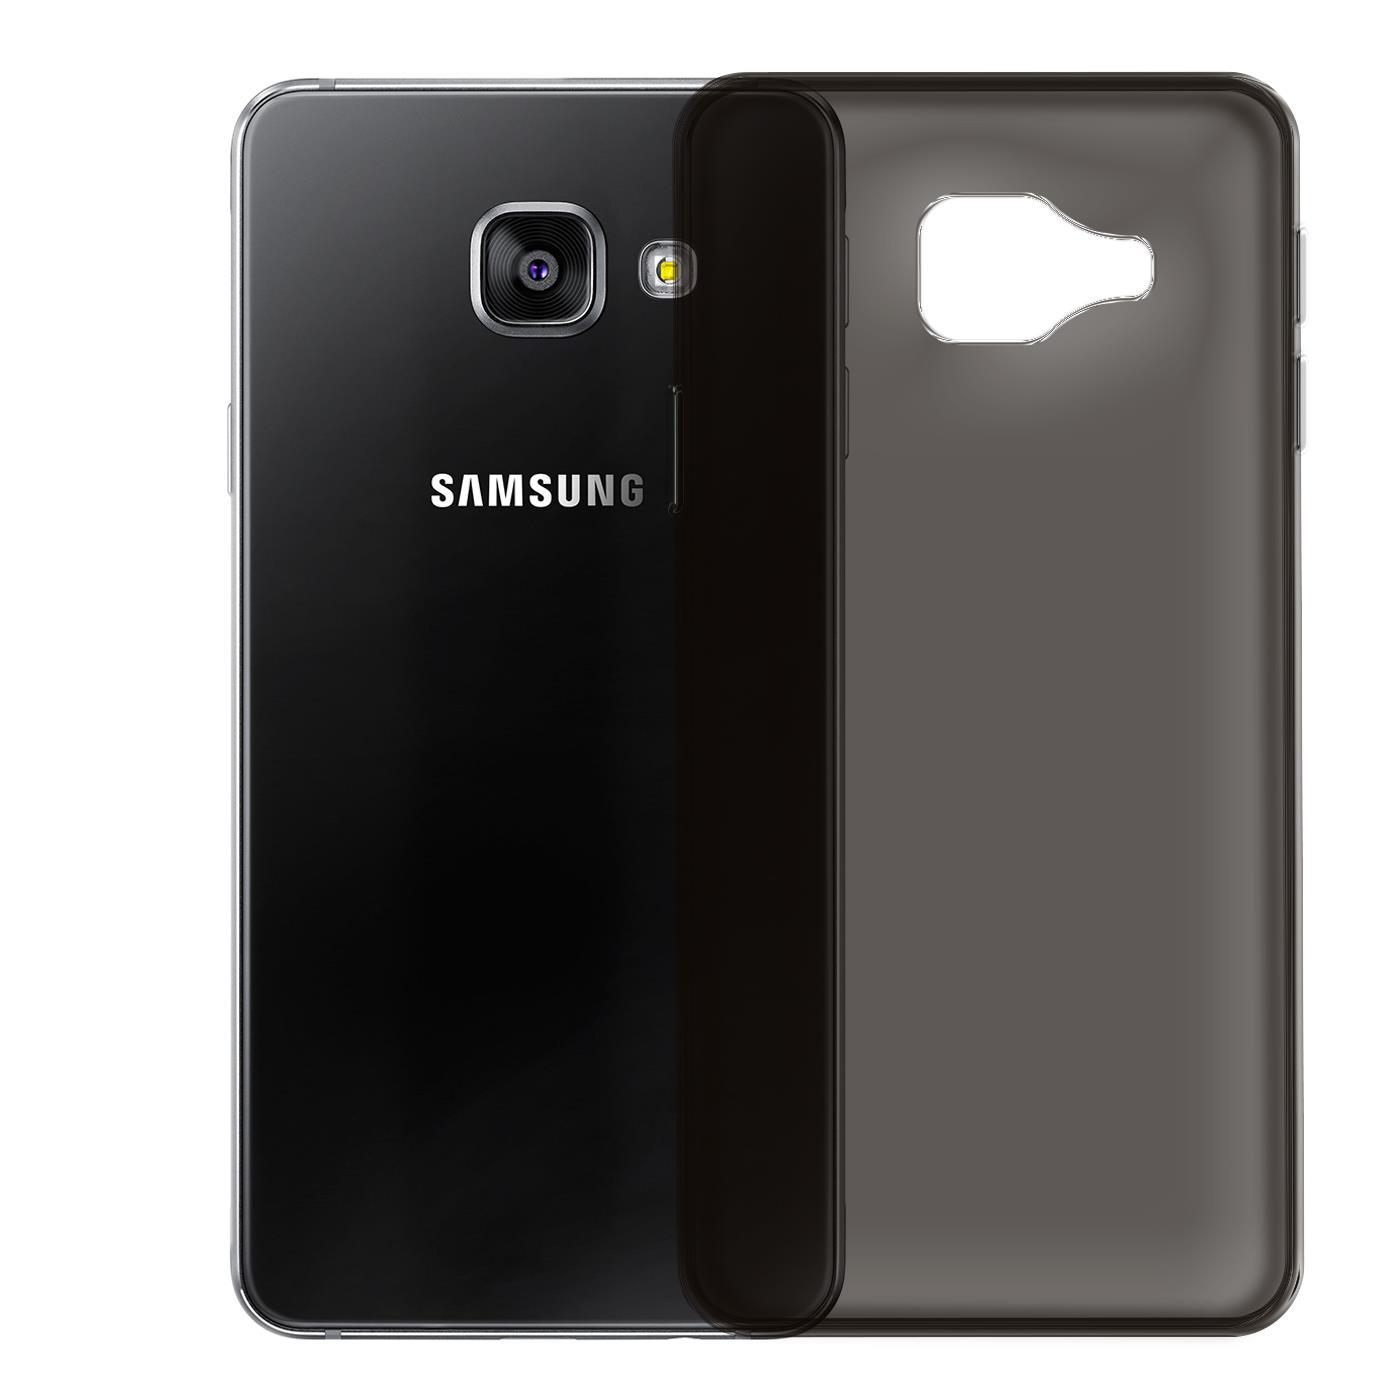 Samsung-Galaxy-a3-2016-Thin-Silikon-Klar-Case-Cover-Ultra-Slim-Stossfeste-Gel Indexbild 28